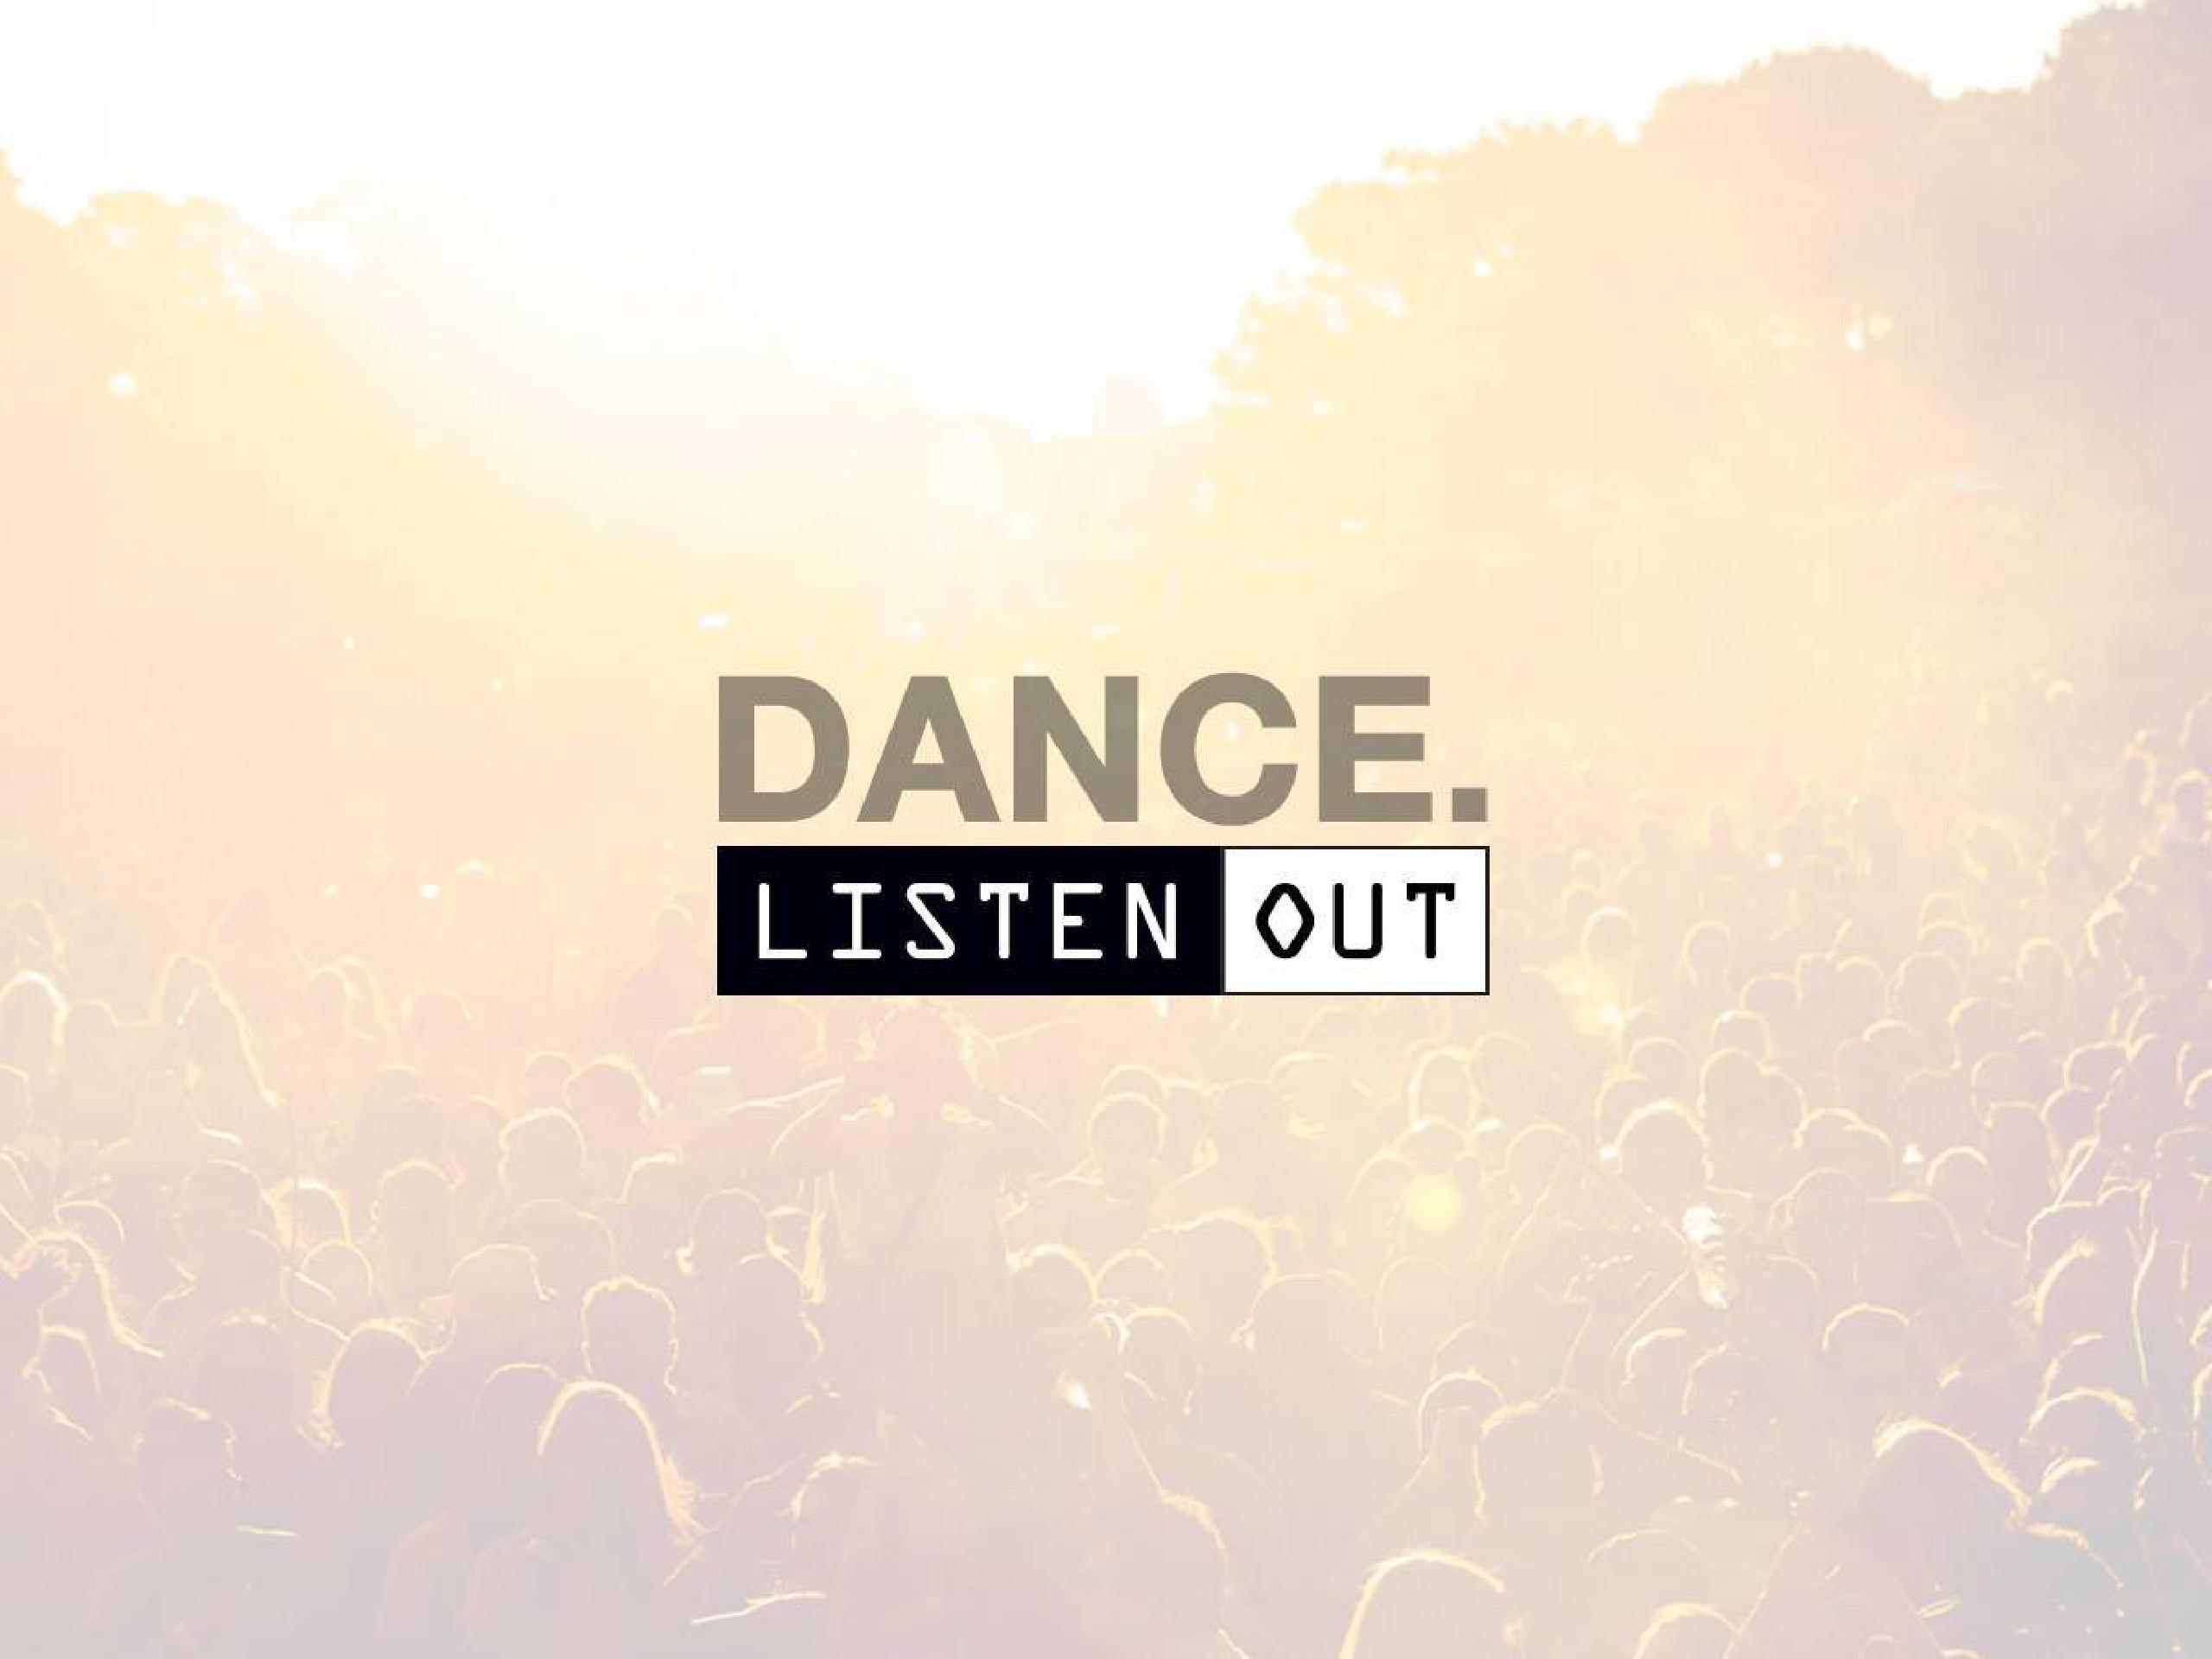 listen out - 895×504